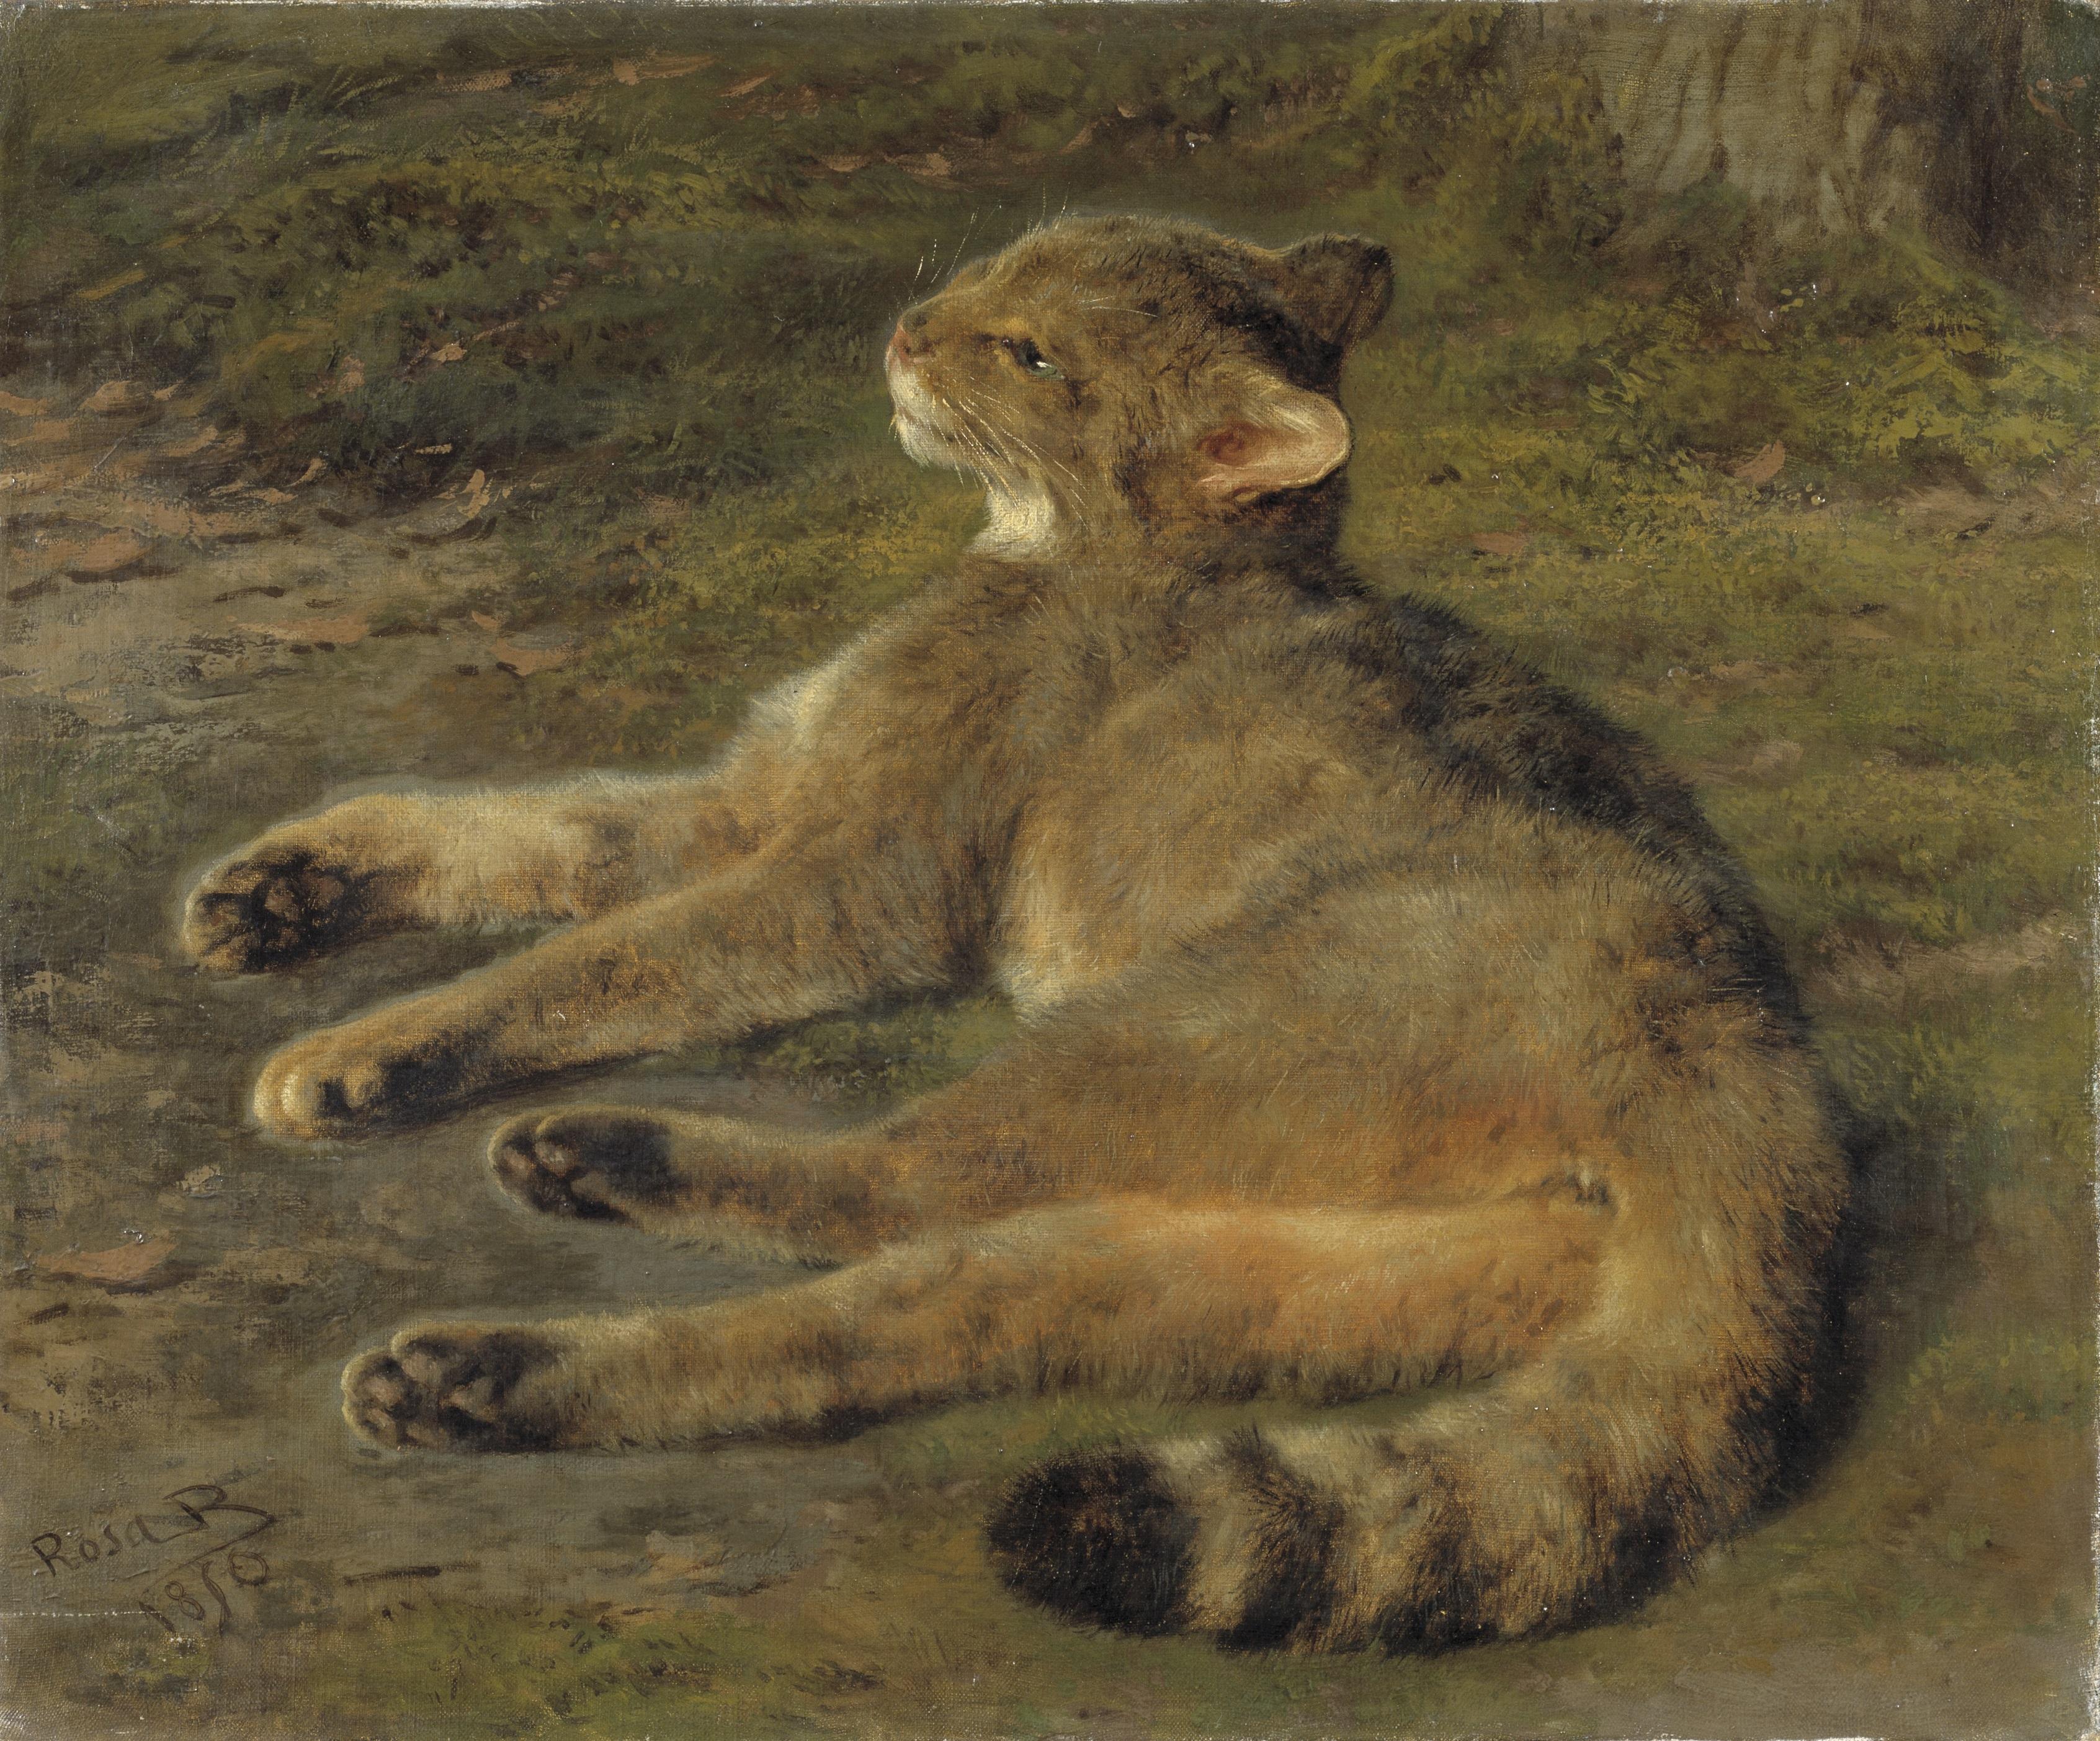 Wild Cat. Rosa Bonheur. 1850